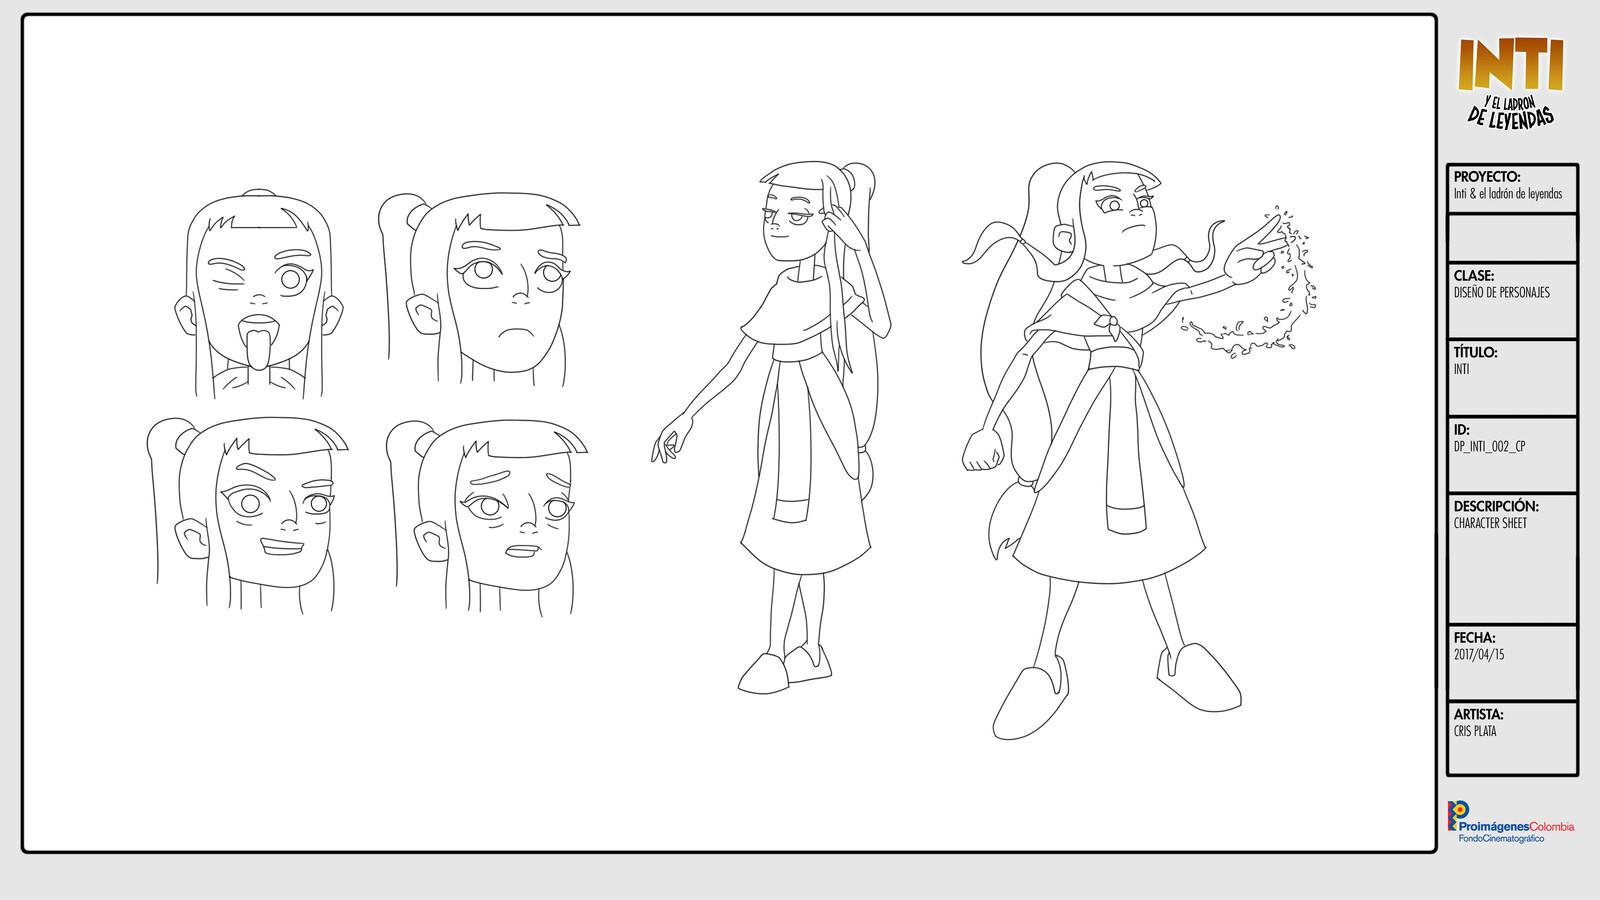 Inti - Character Design /  Character Sheet